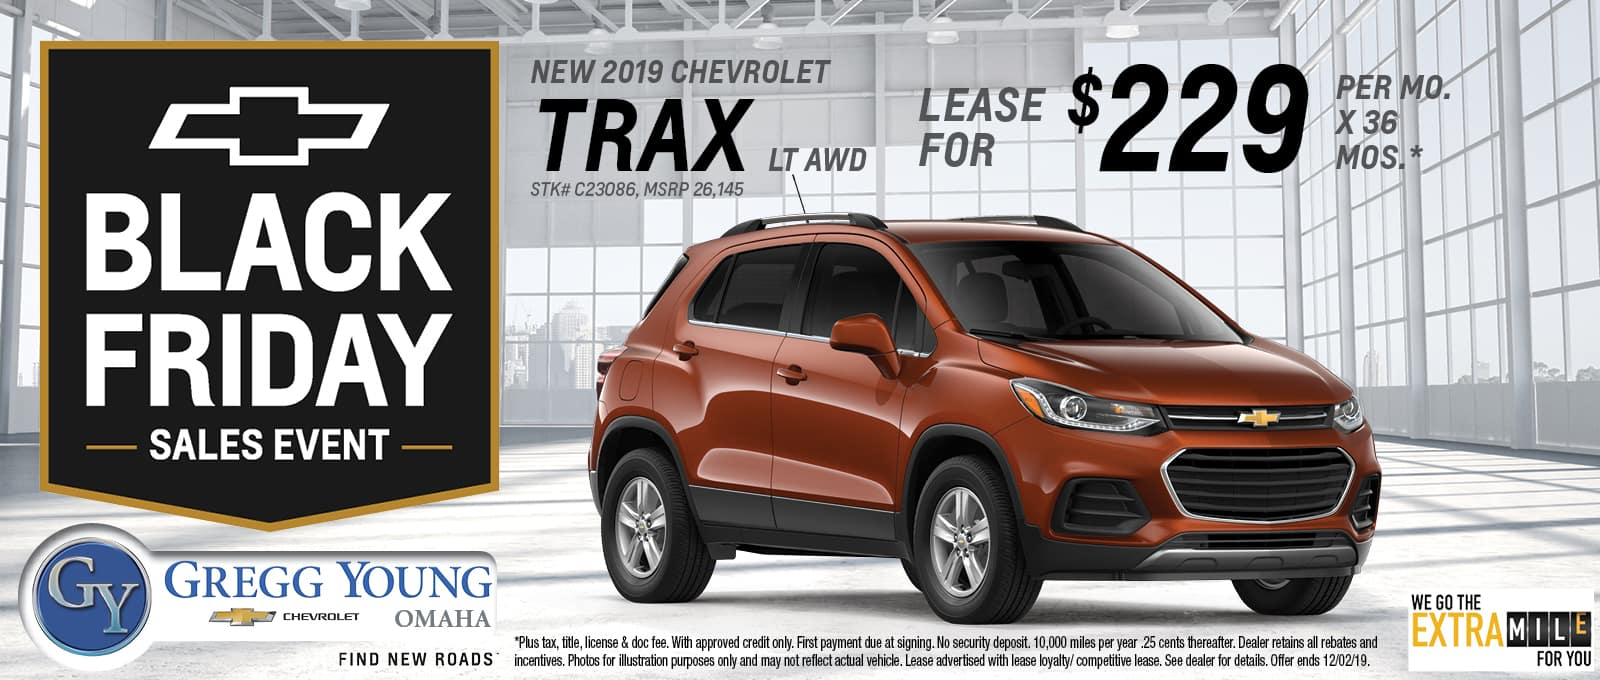 2019 Chevy Trax